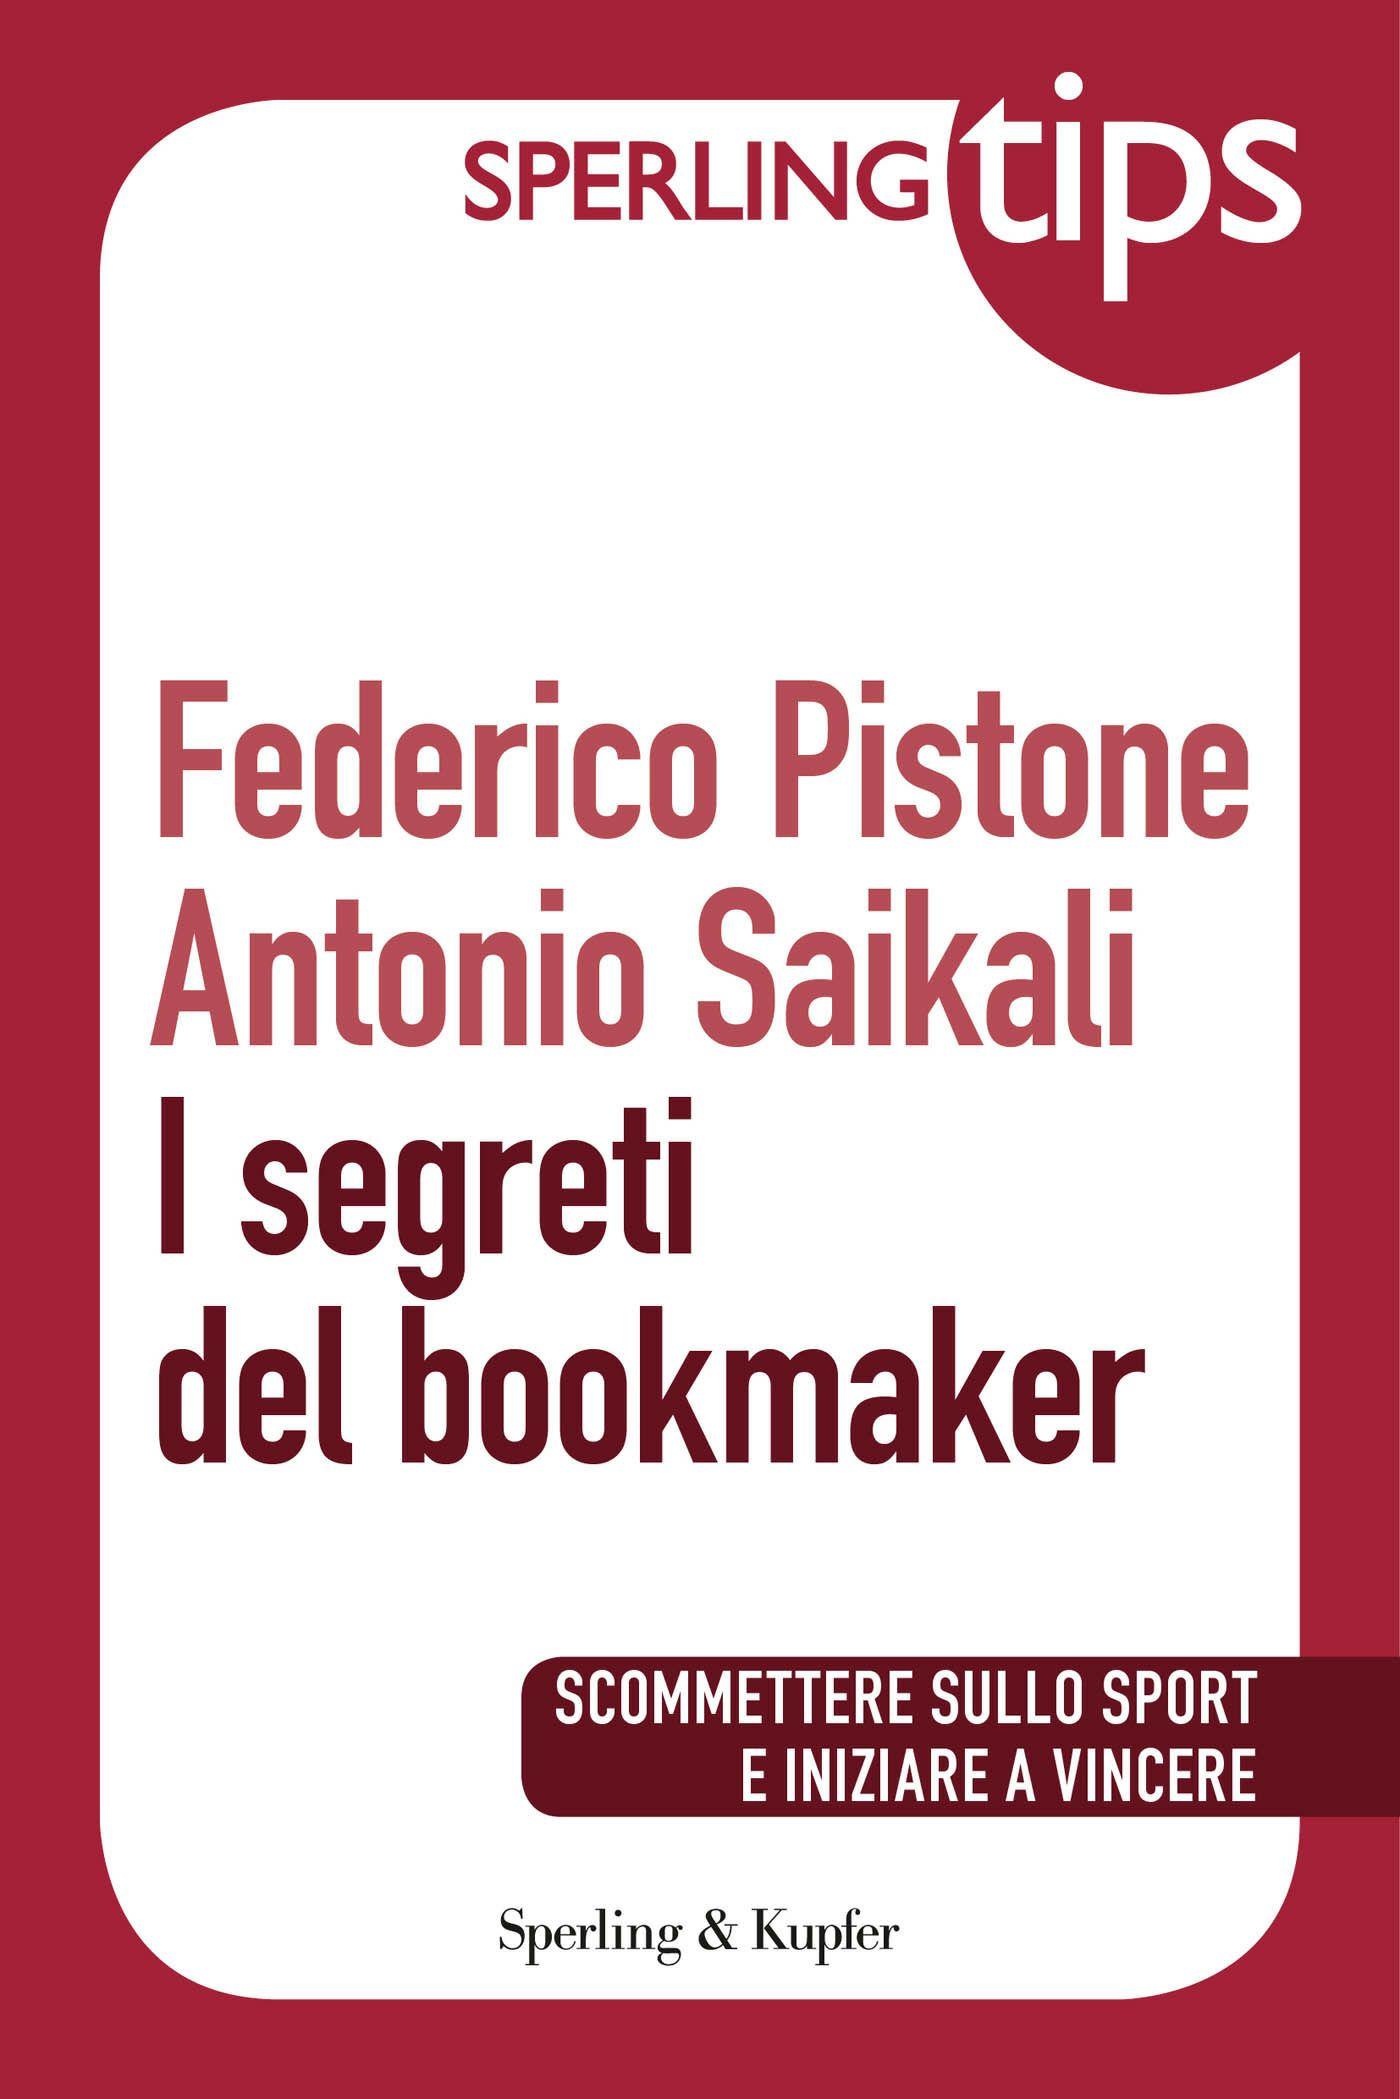 I Segreti del bookmaker